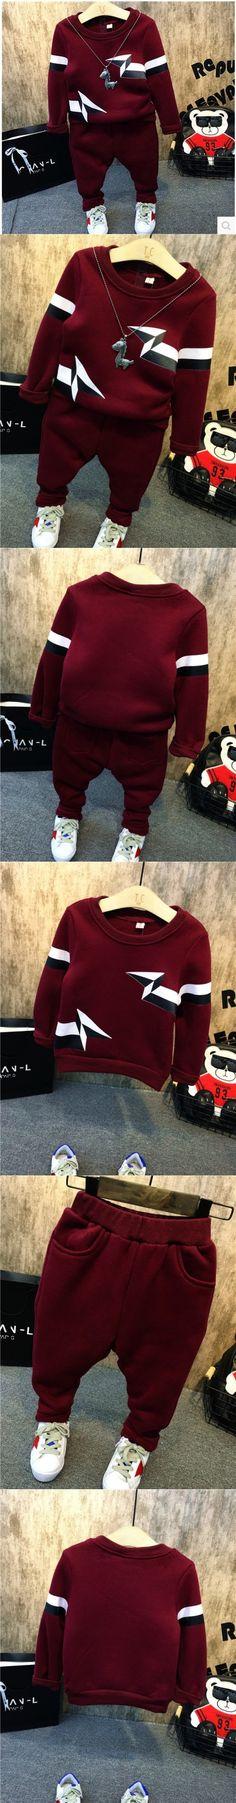 Festival christmas baby clothes set suits autunm winter 2016 kids clothes boys clothing sets active children sport suits retail $17.56